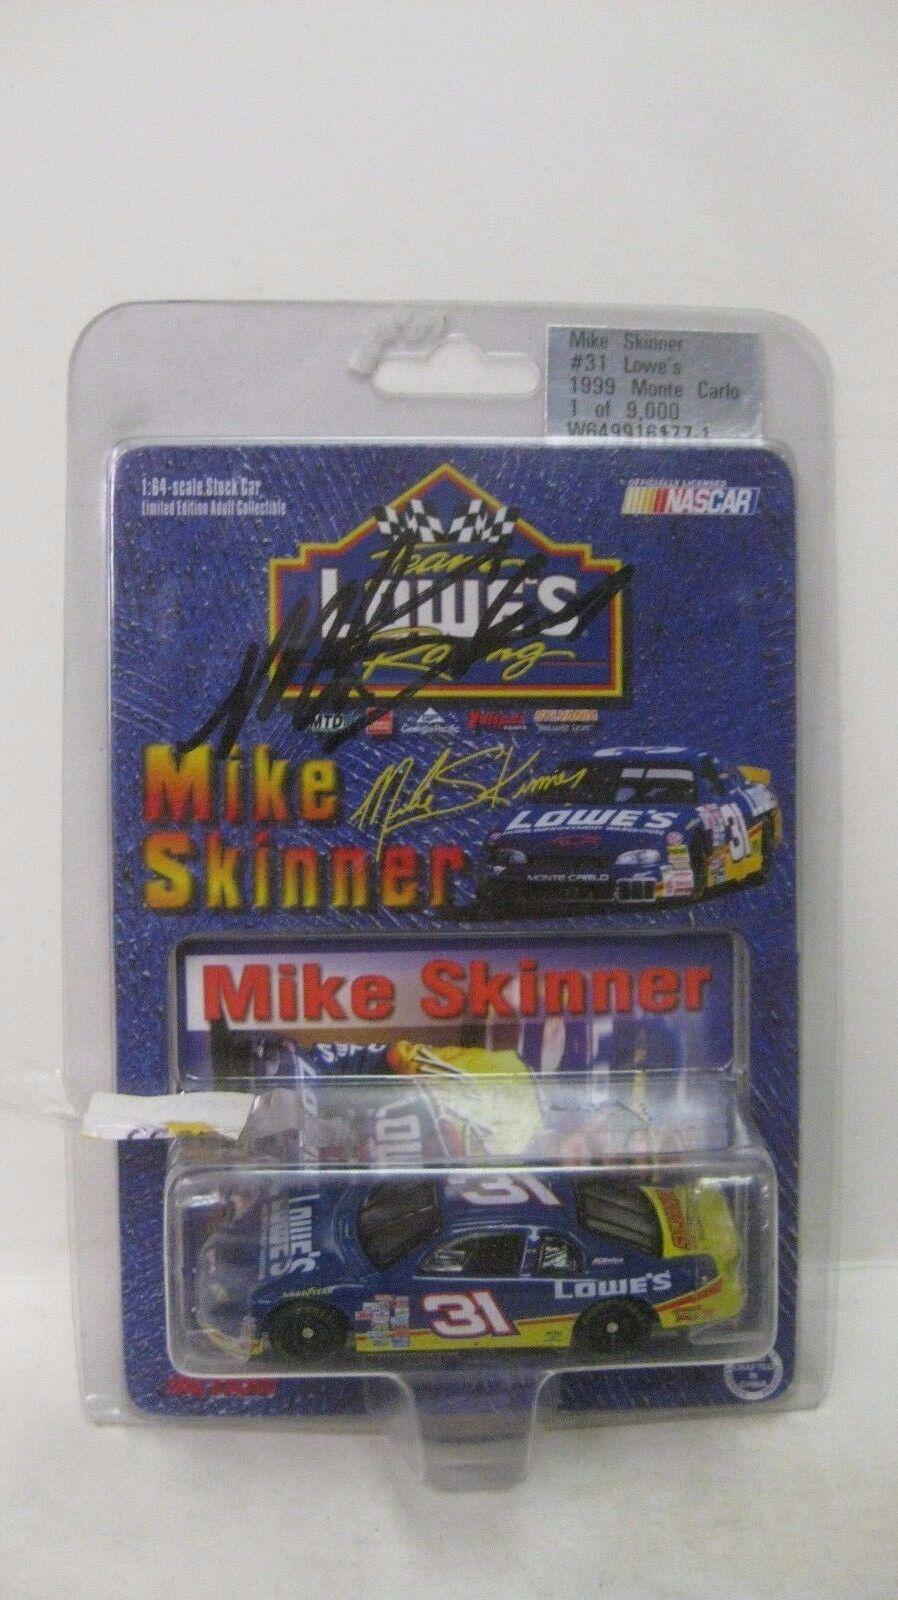 Raro Nascar Mike Skinner Firmado Le Chevy 1 64 de Metal 1999 Nuevo dc1452